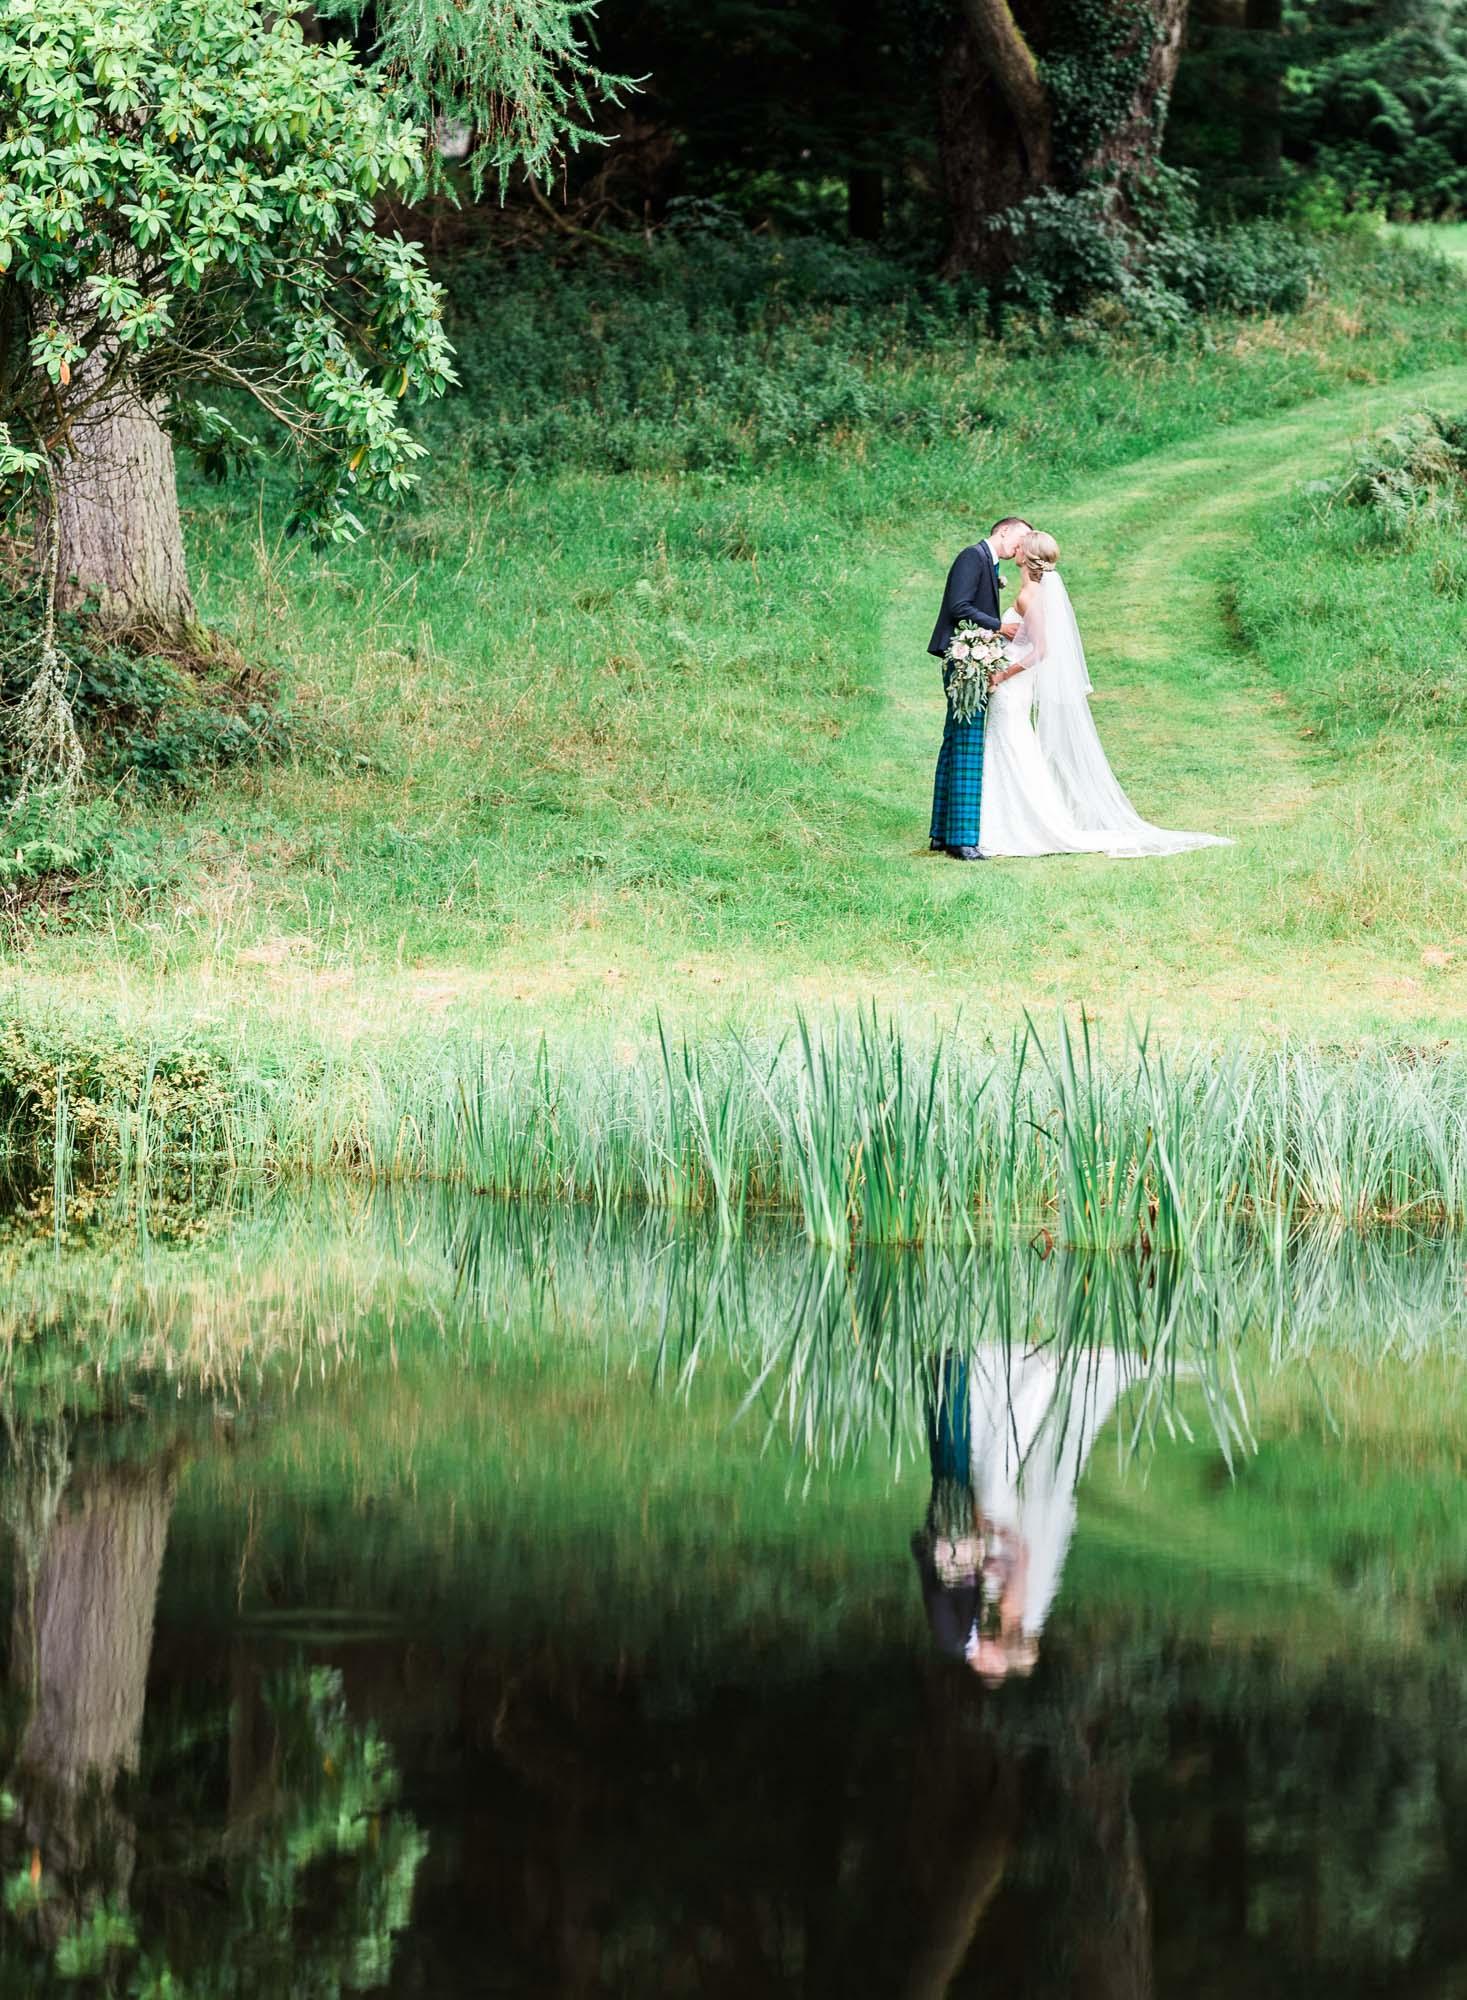 scottish_wedding_blairquhan_castle-81.jpg